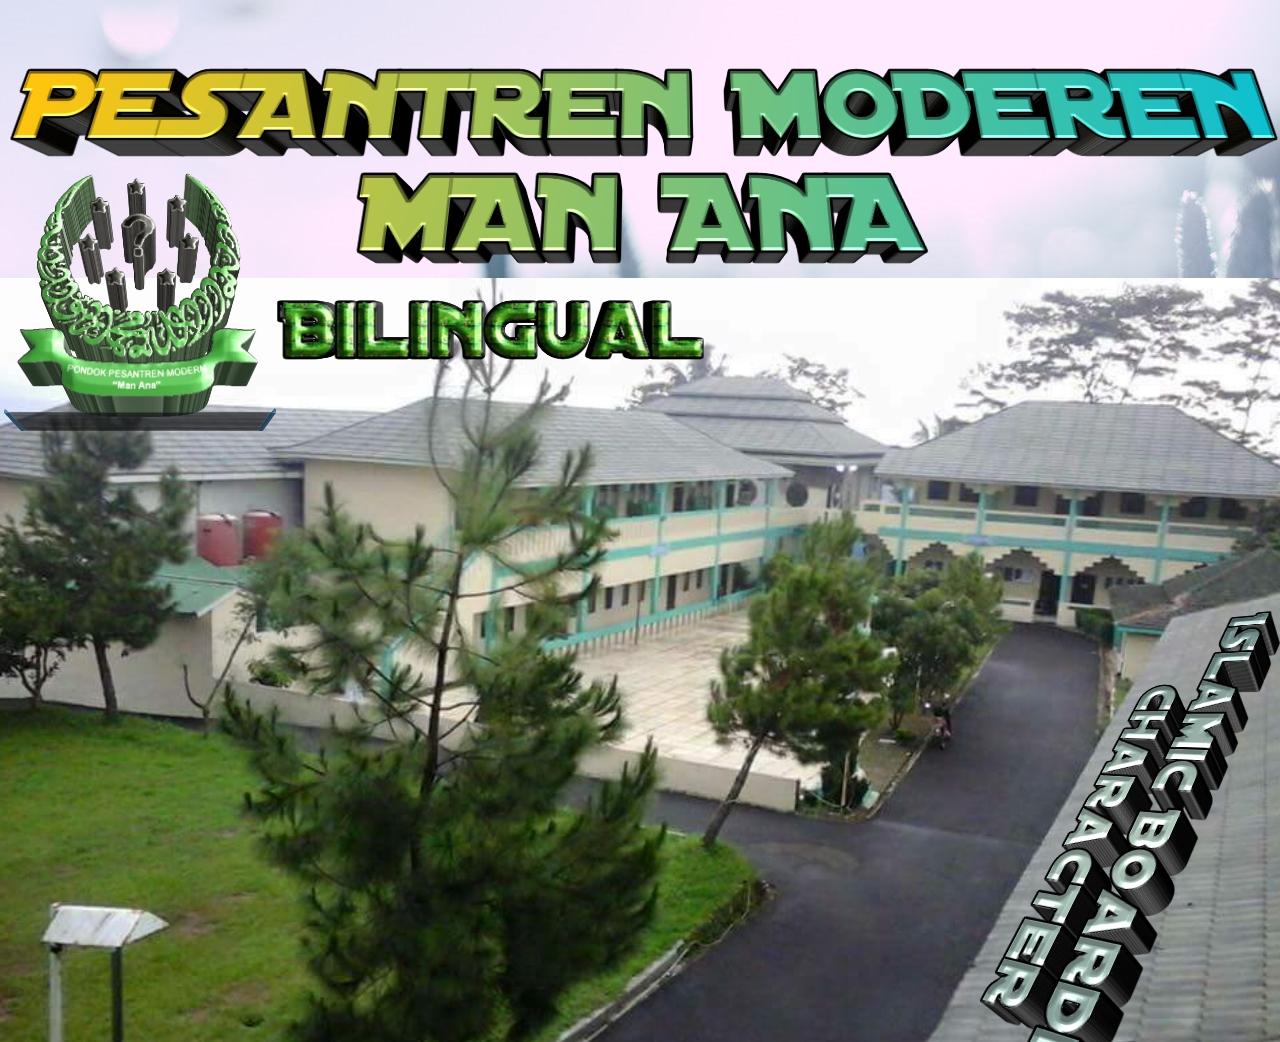 Pesantren Modern Man Ana